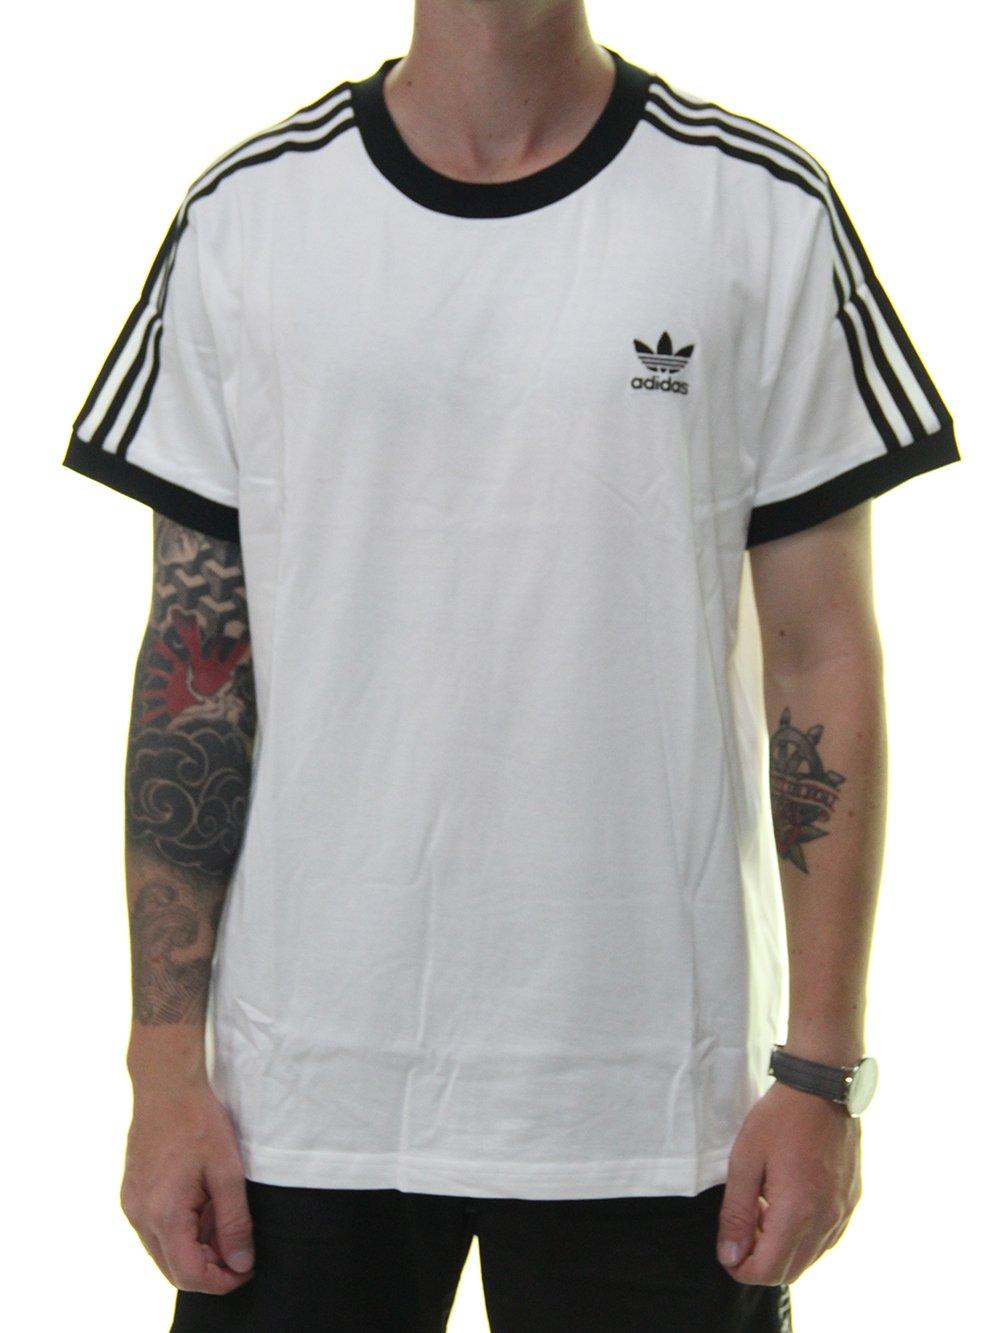 12b5d692eef Camiseta Masculina Adidas 3 Stripes Manga Curta - Preto Branco ...